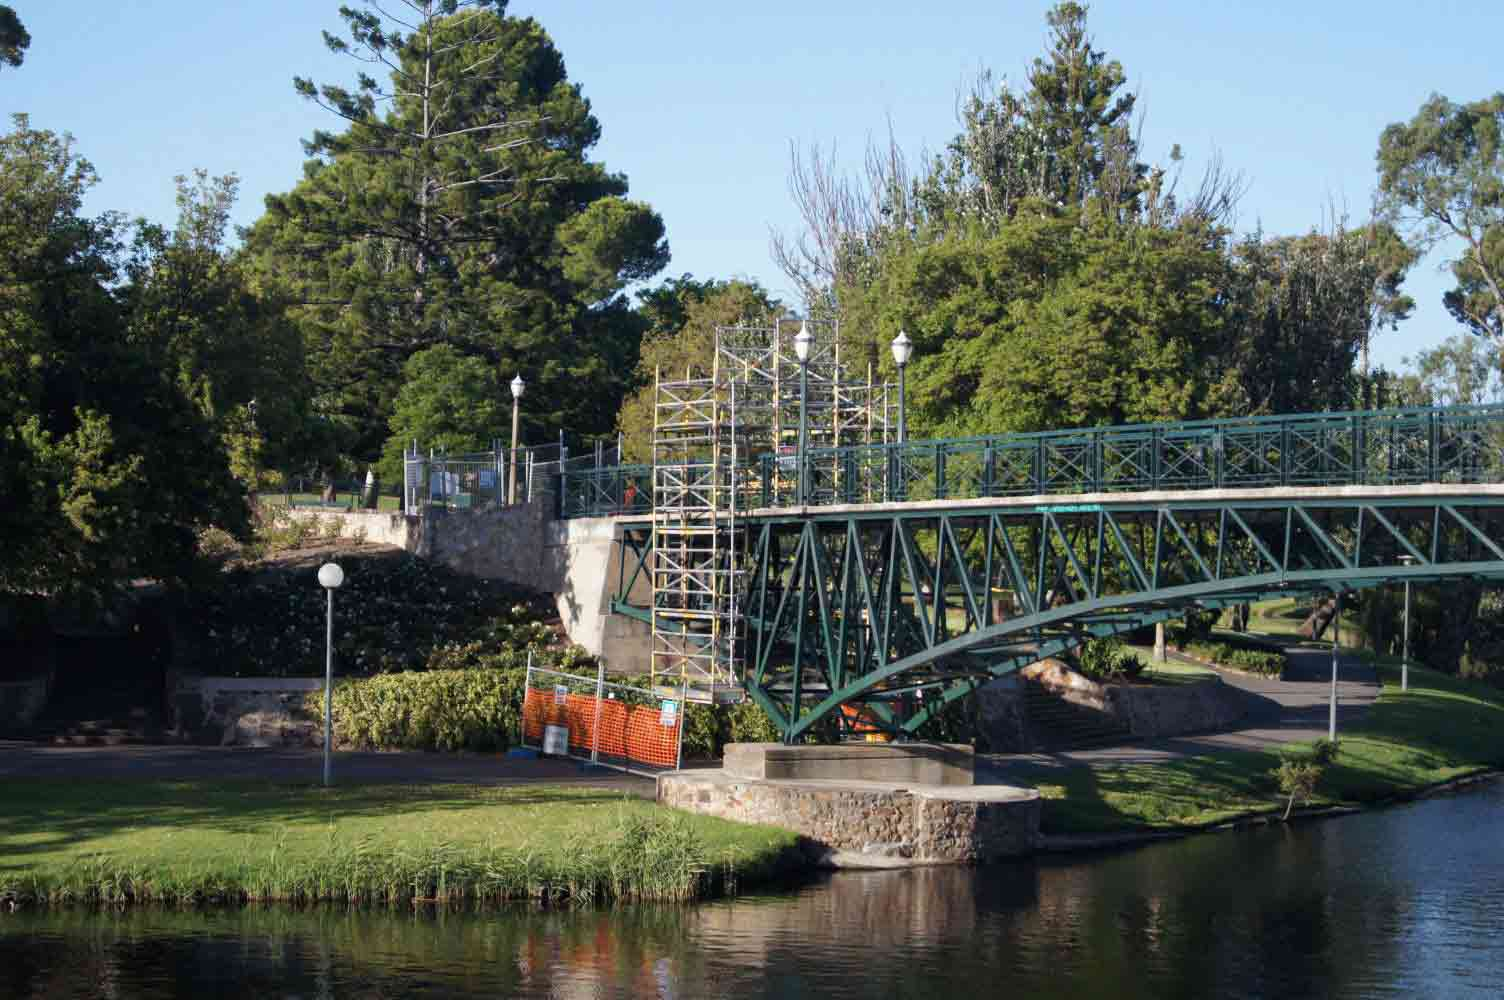 scaffolding on long green bridge